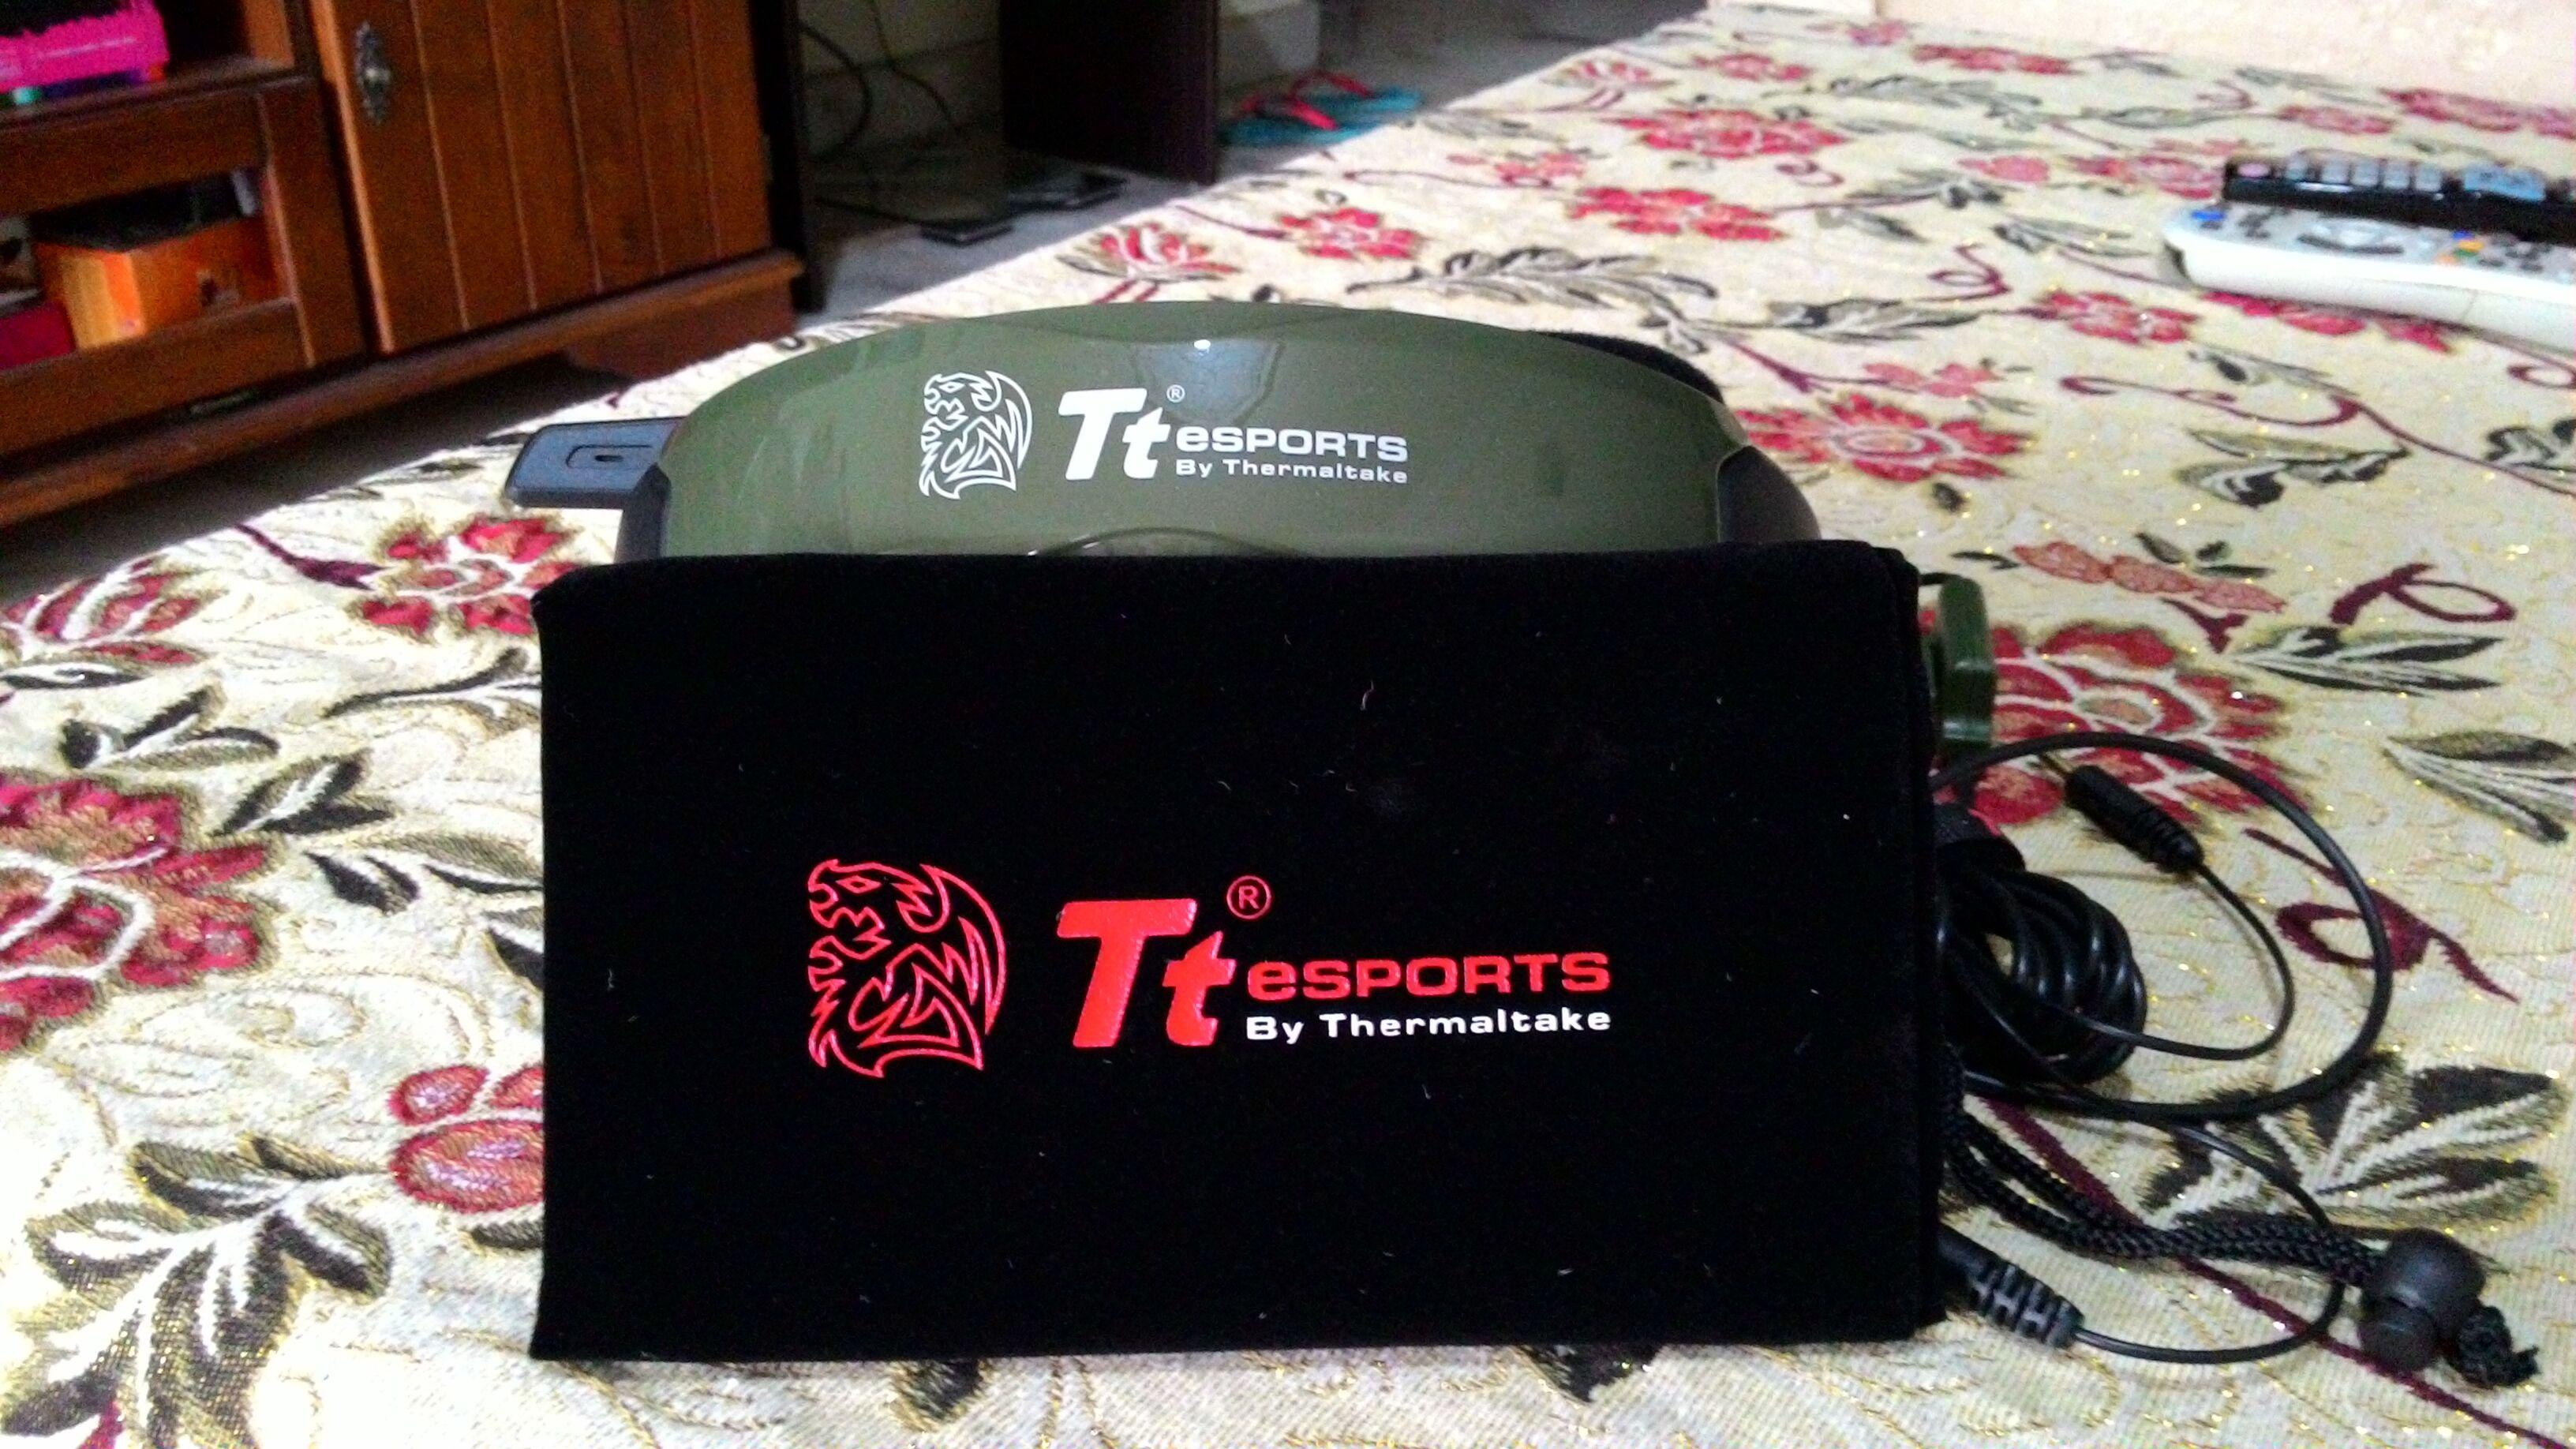 Tt eSPORTS Shock Gaming Headset Review 23